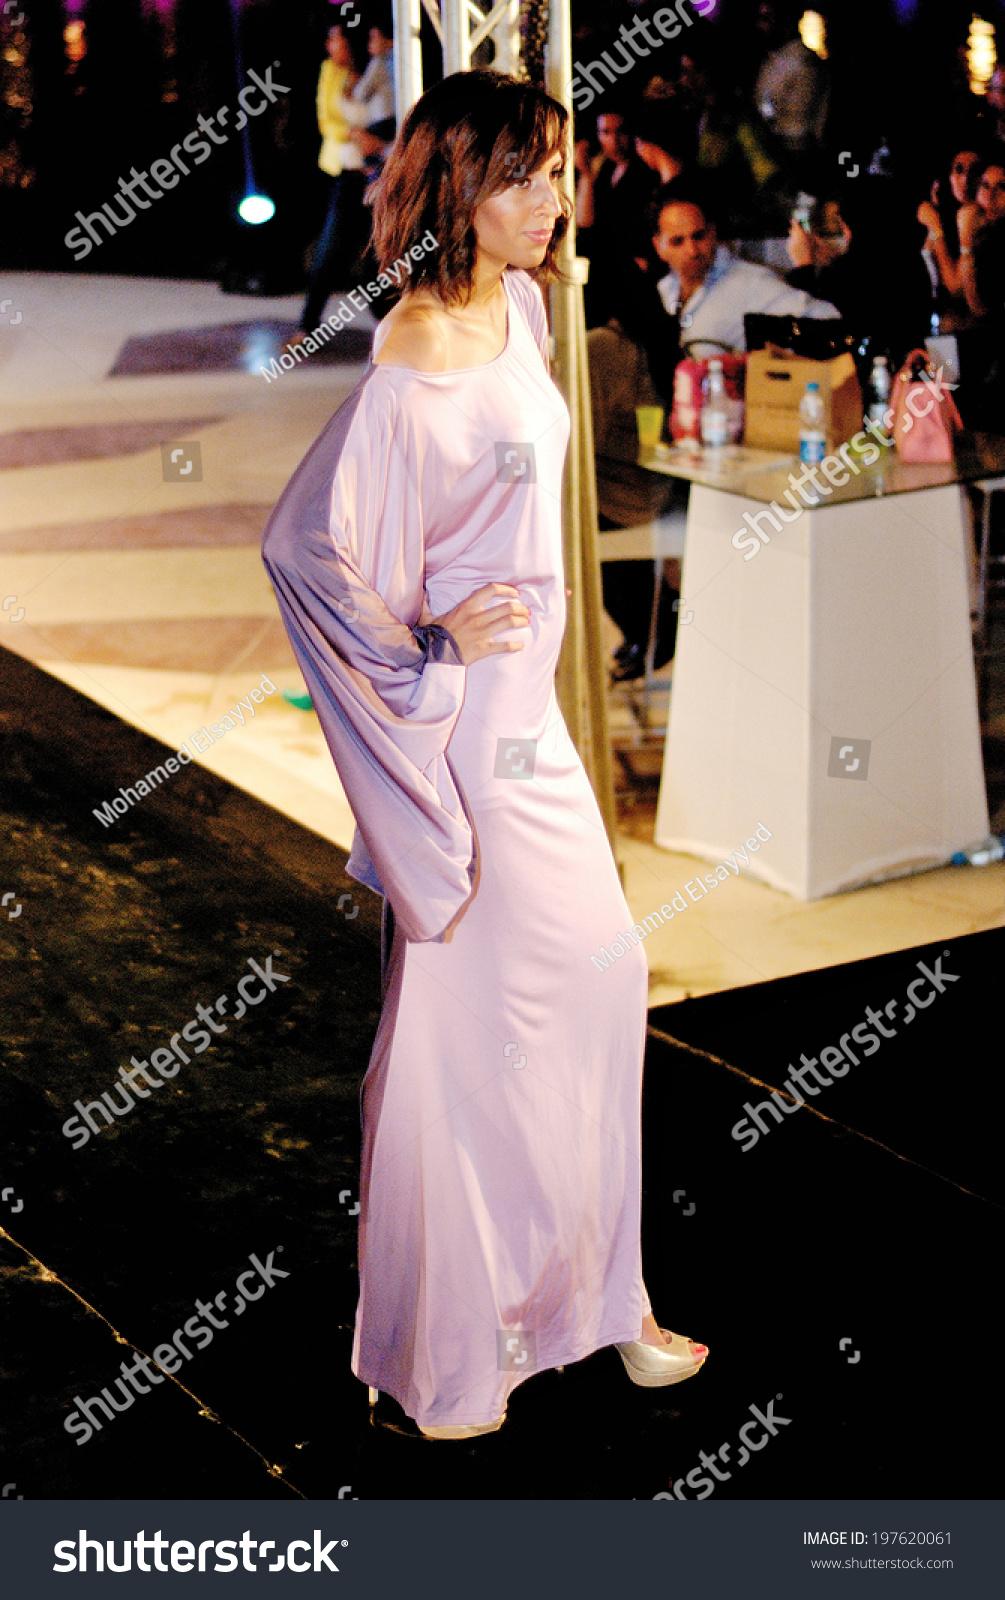 Cairo april 25 model at cairo fashion festival fashion for Cairo mobel